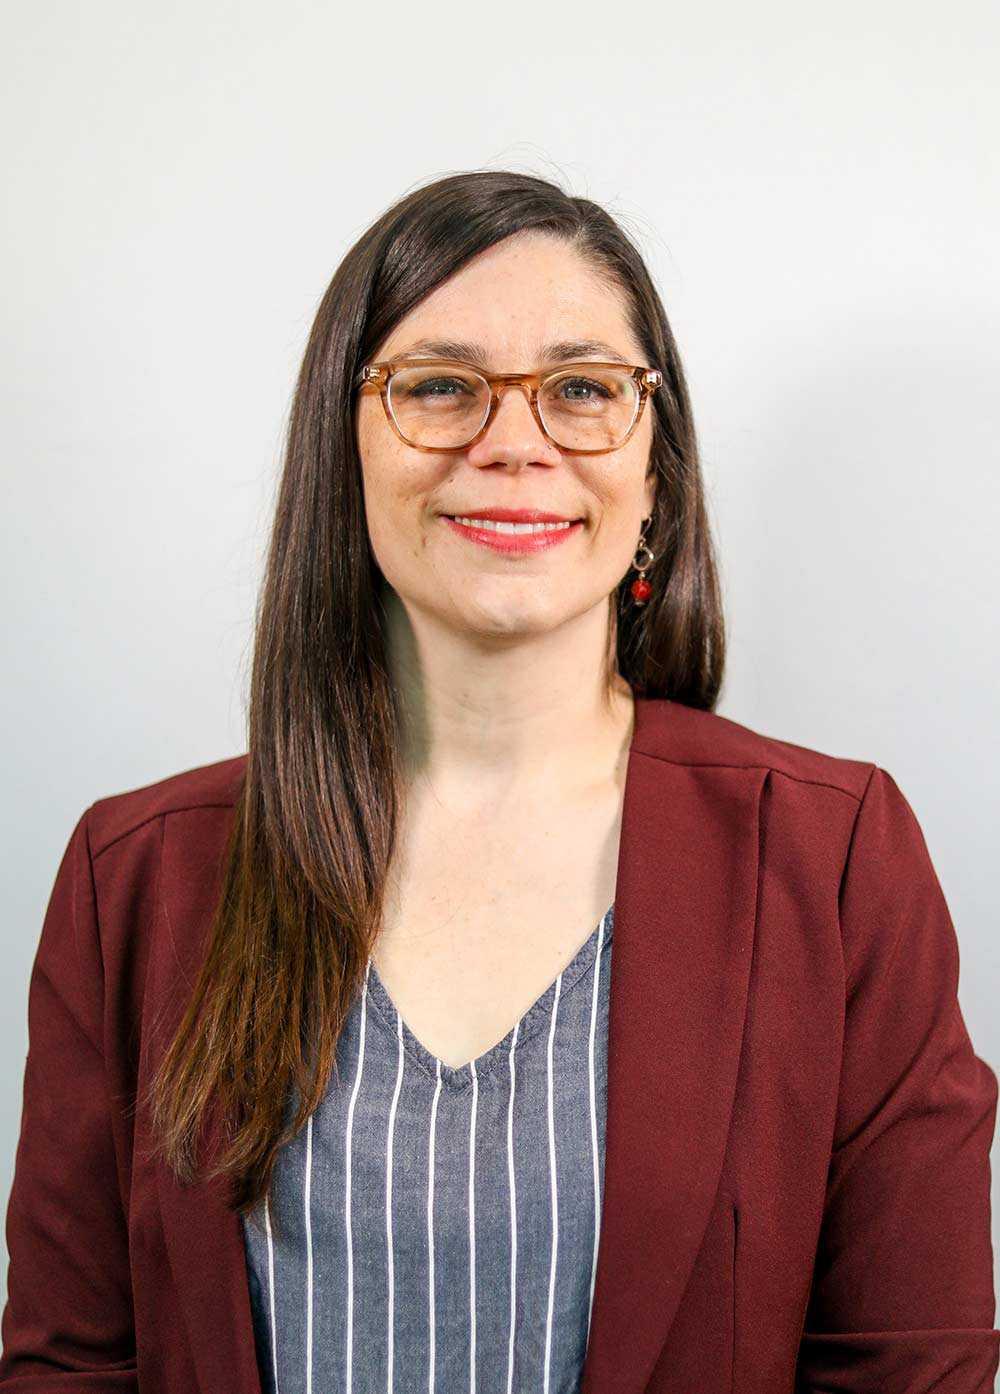 Headshot of Heather Van Diest